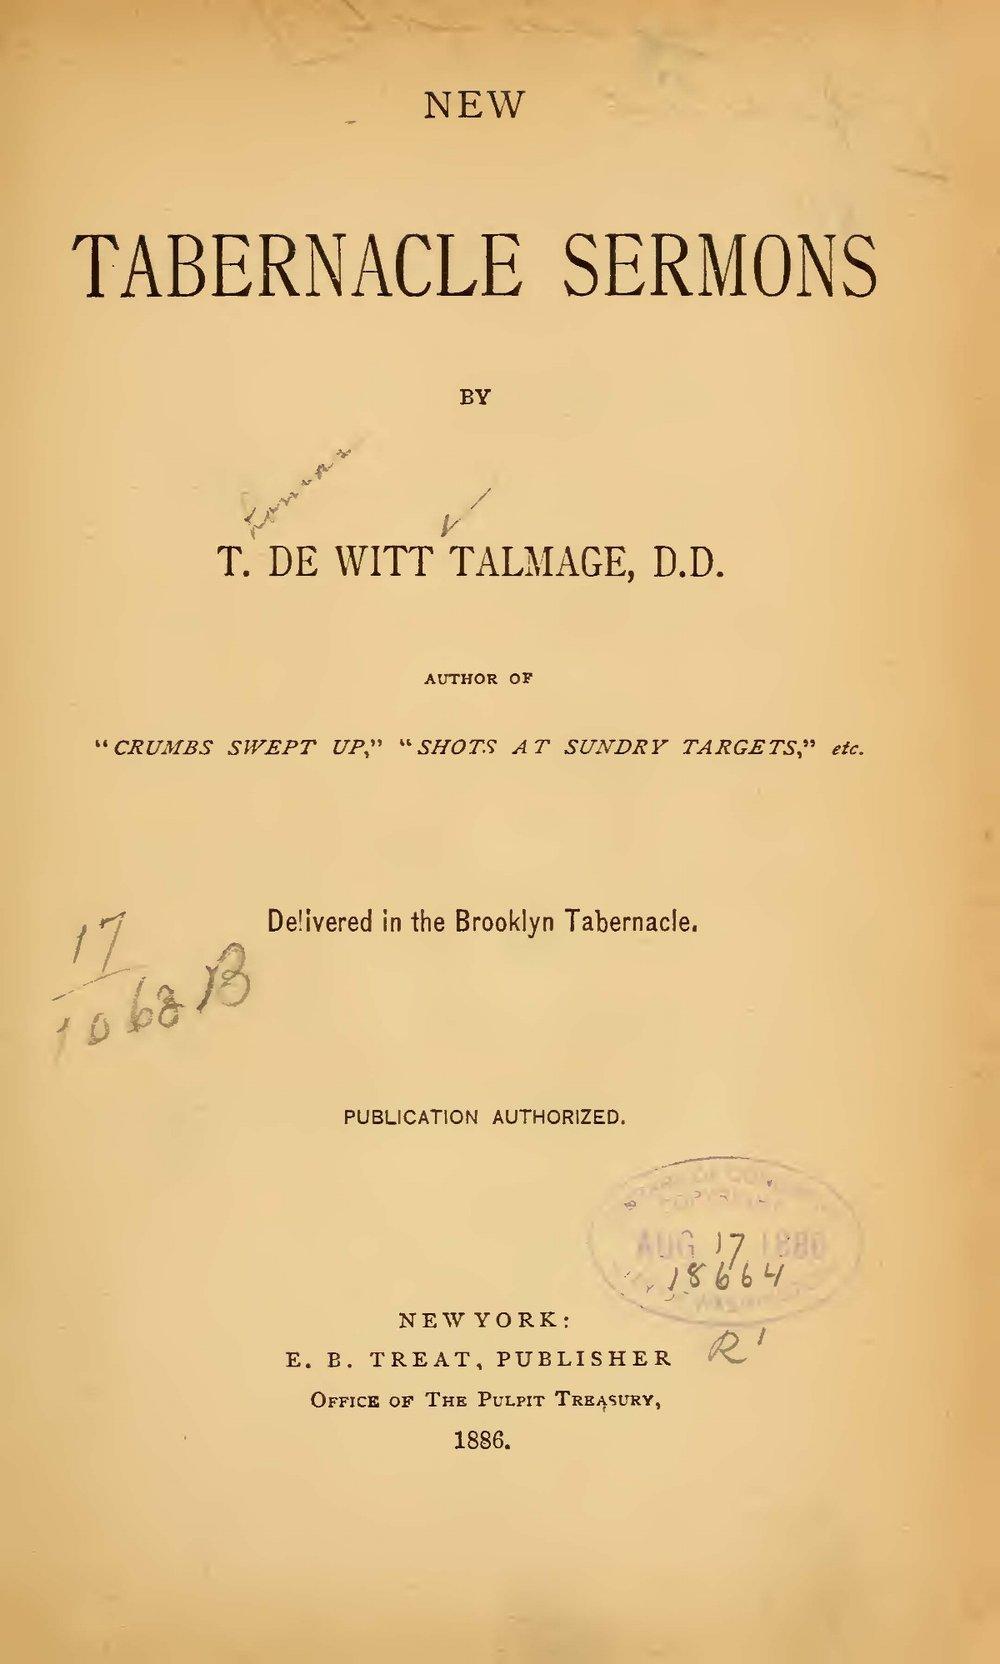 Talmage, Thomas De Witt, New Tabernacle Sermons Title Page.jpg